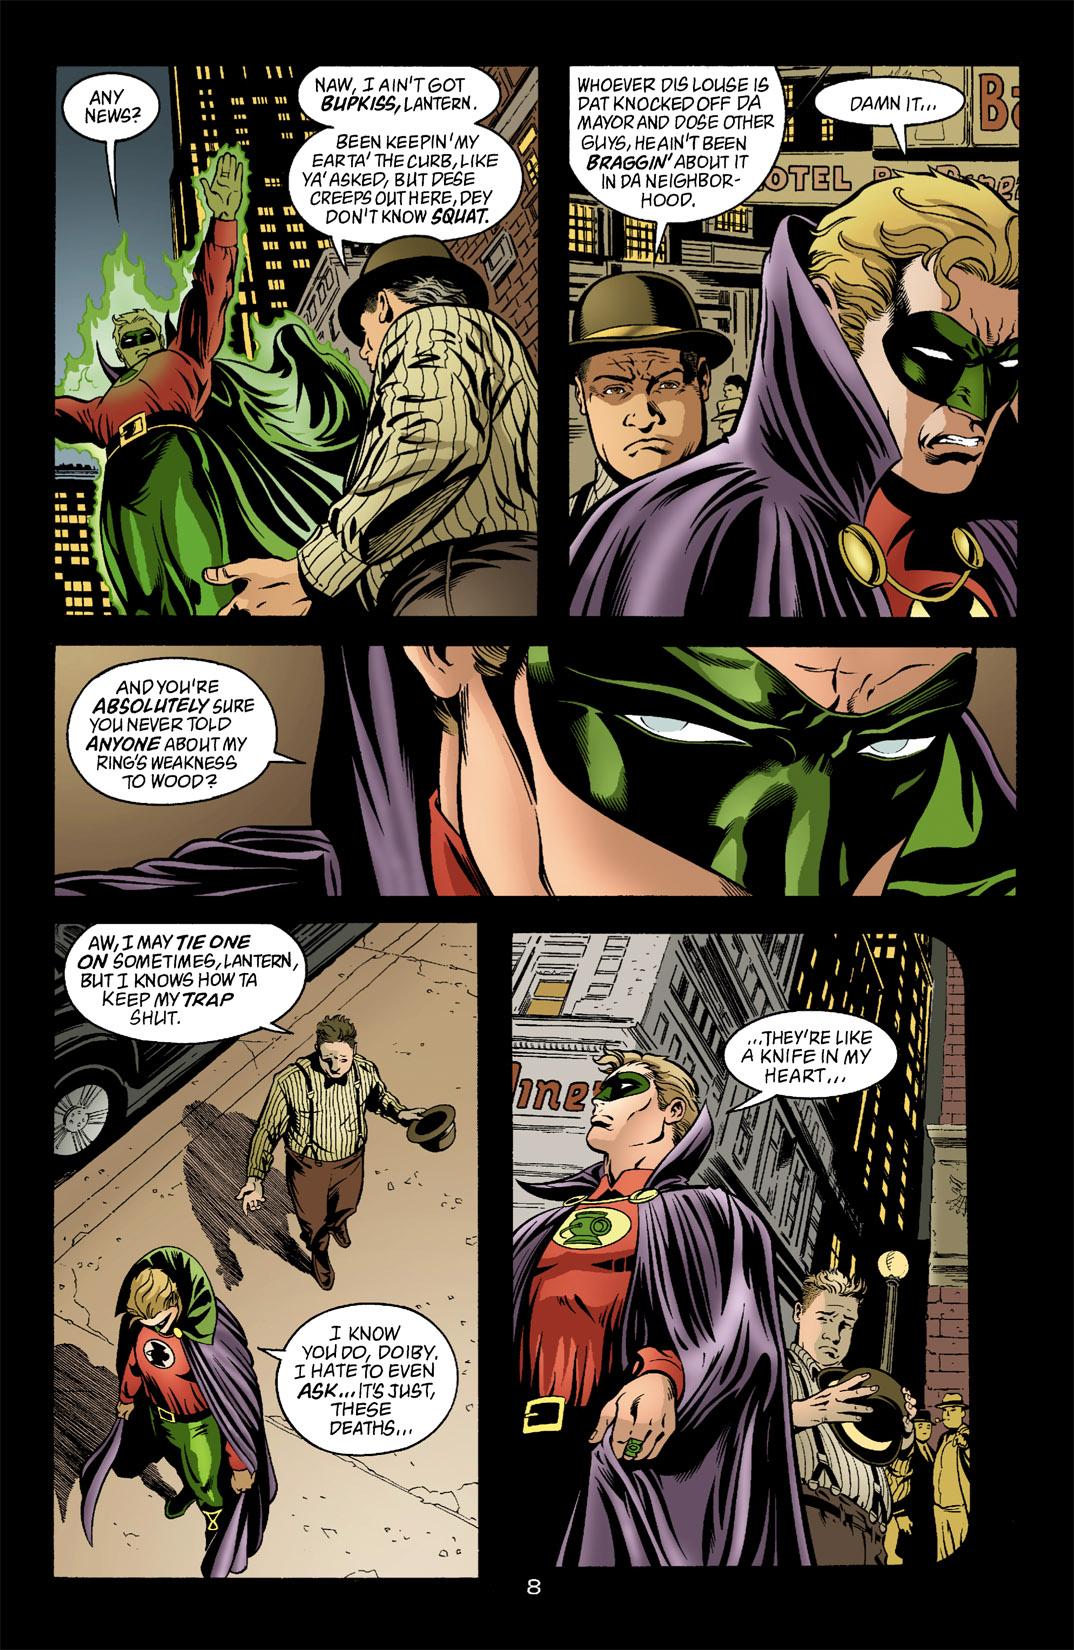 Detective Comics (1937) 785 Page 8